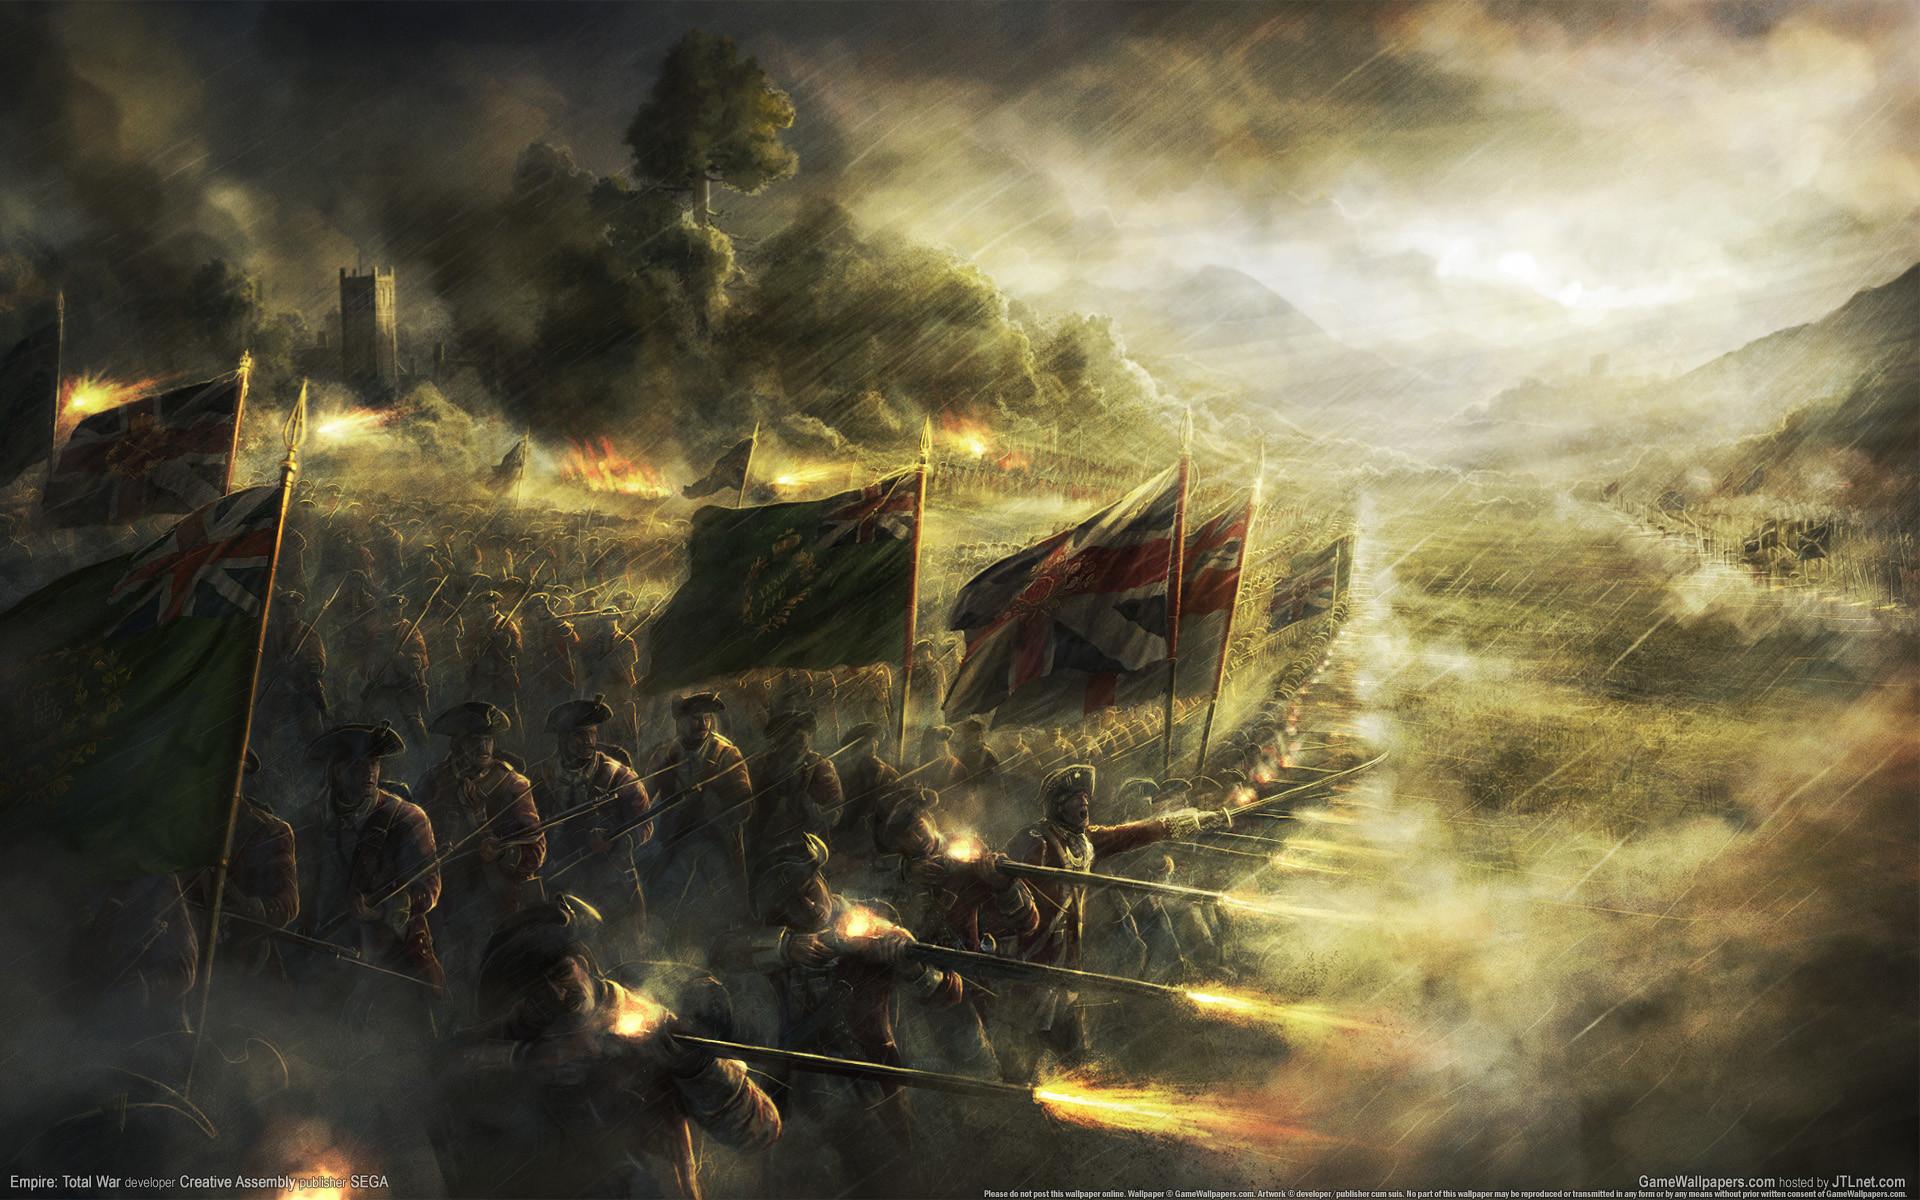 Empire Total War 4 wallpapers (14 Wallpapers)